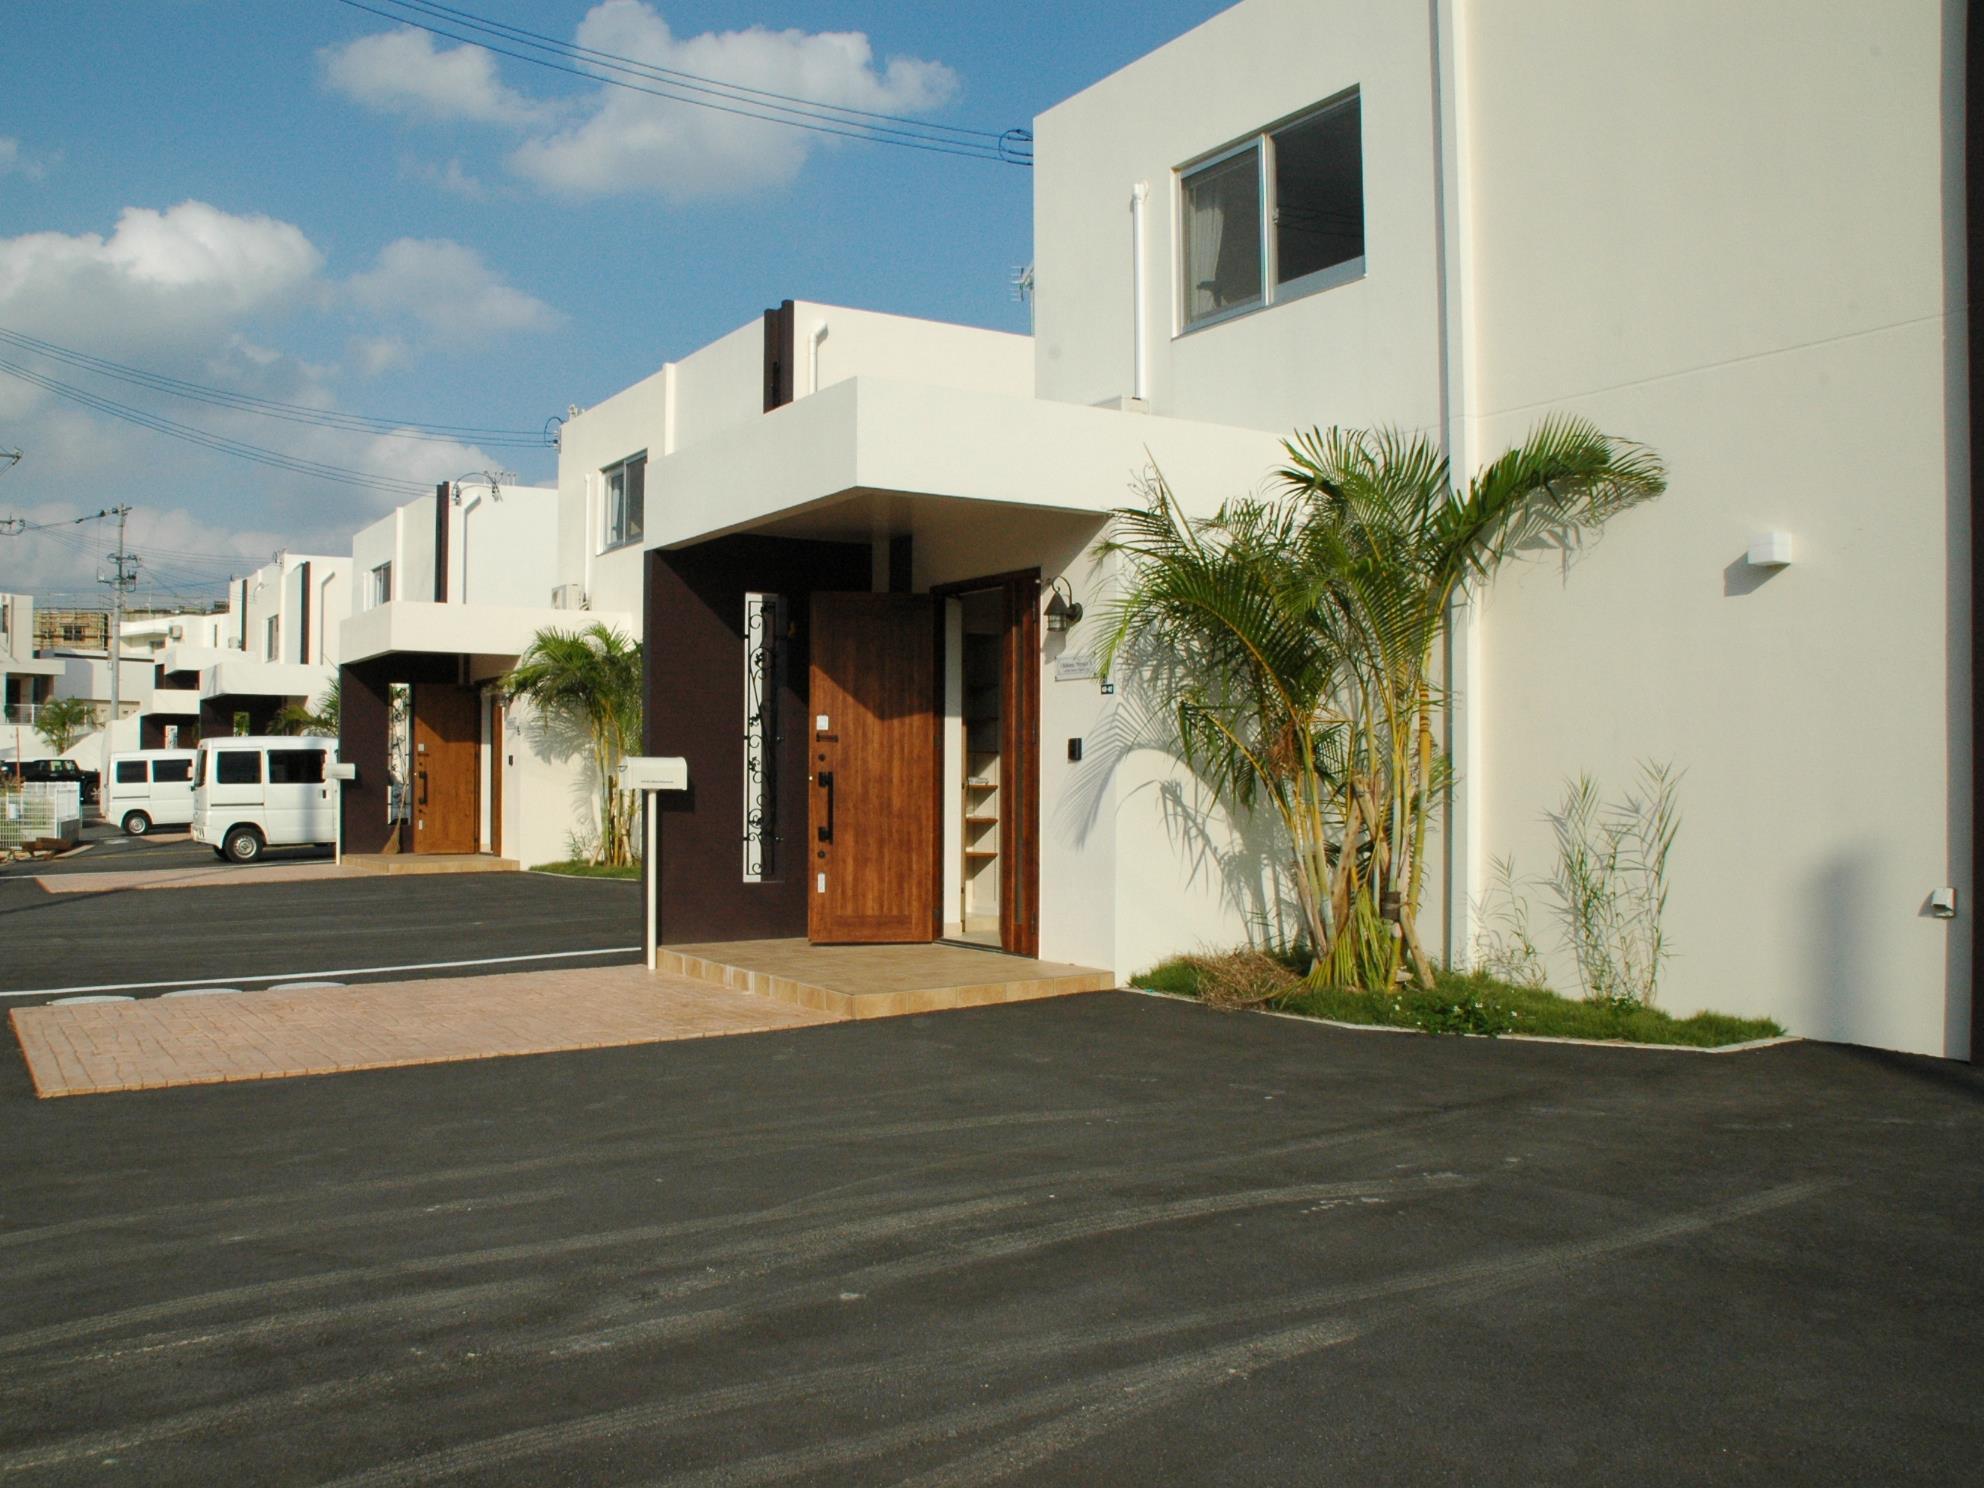 Chibana Terrace